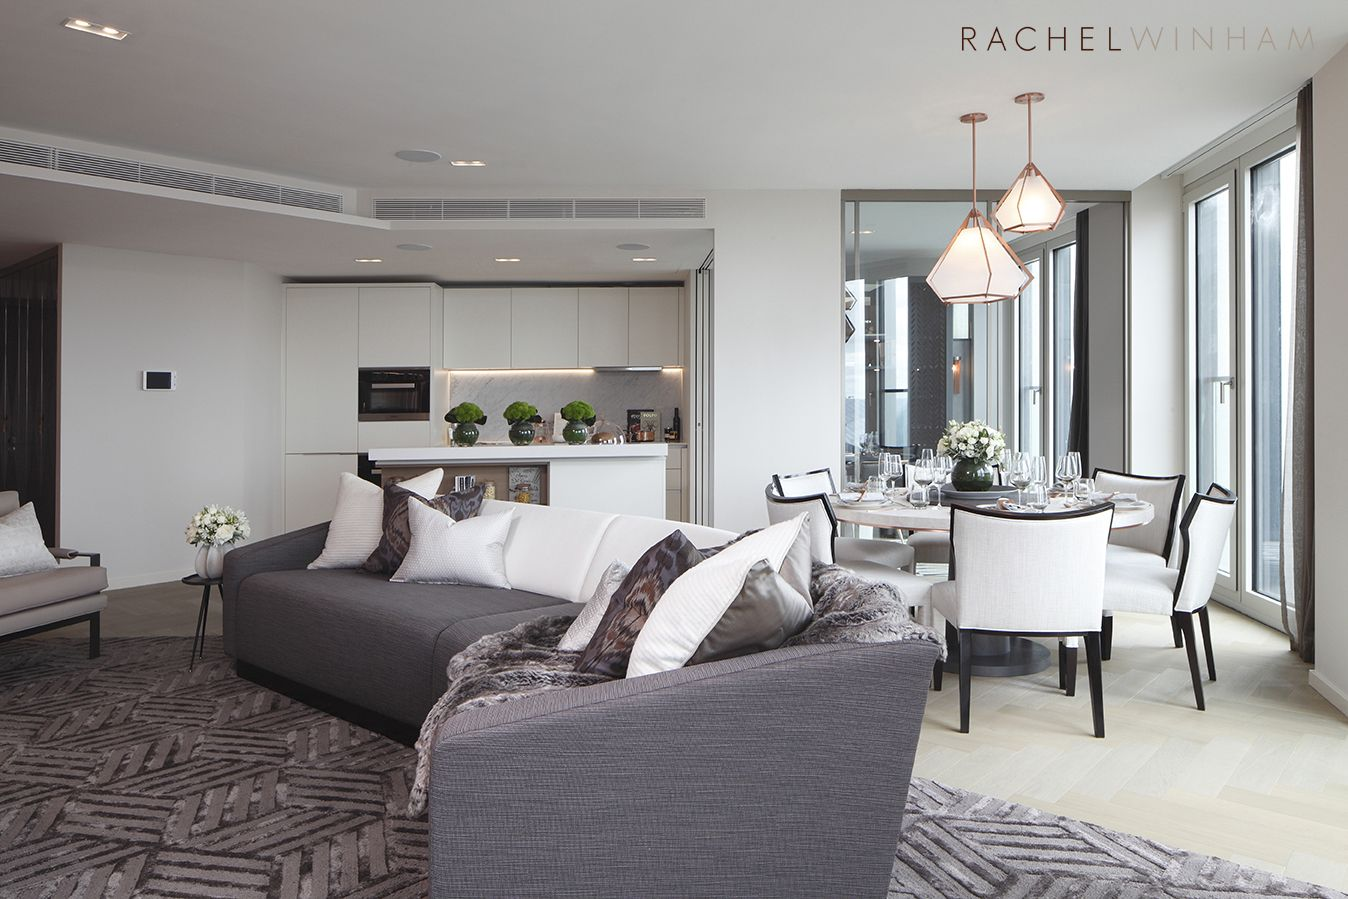 Living and Dining Room Rachel Winham